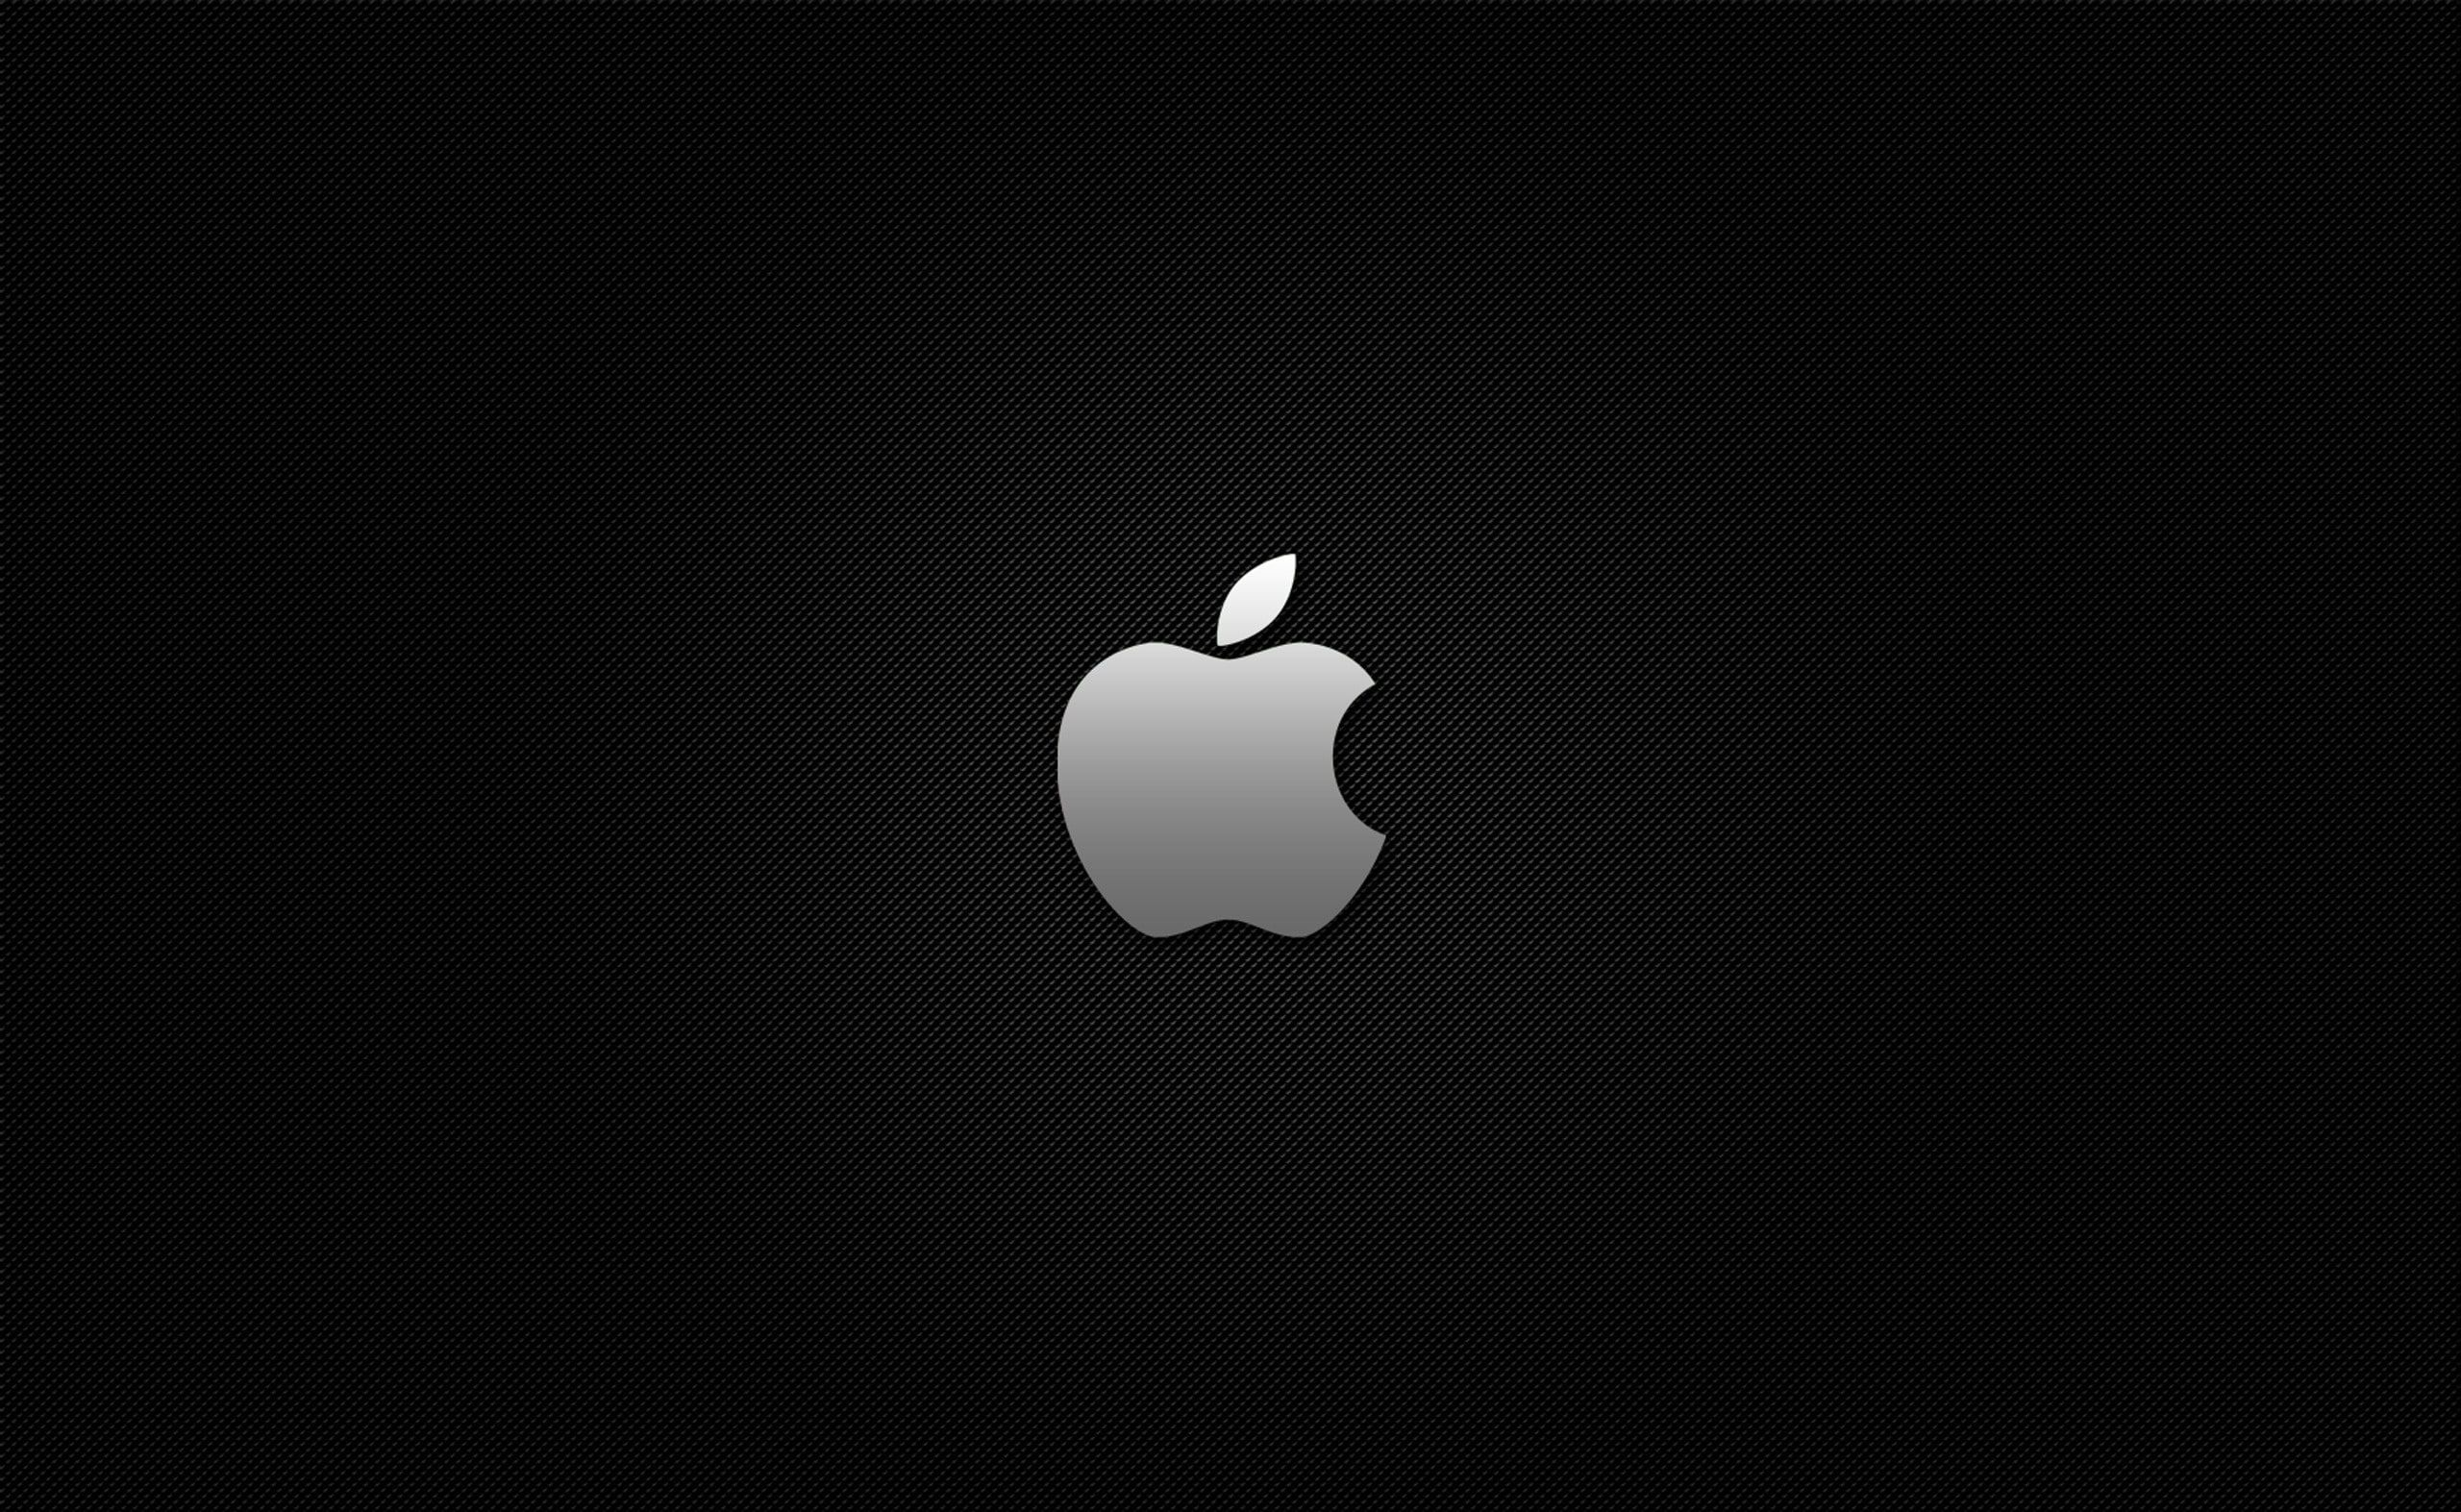 Apple Carbon Apple Logo Computers Mac Apple Carbon Carbon Fiber Carbon Fiber Background Apple Carbon 2k Live Wallpaper Iphone Wallpaper Apple Wallpaper